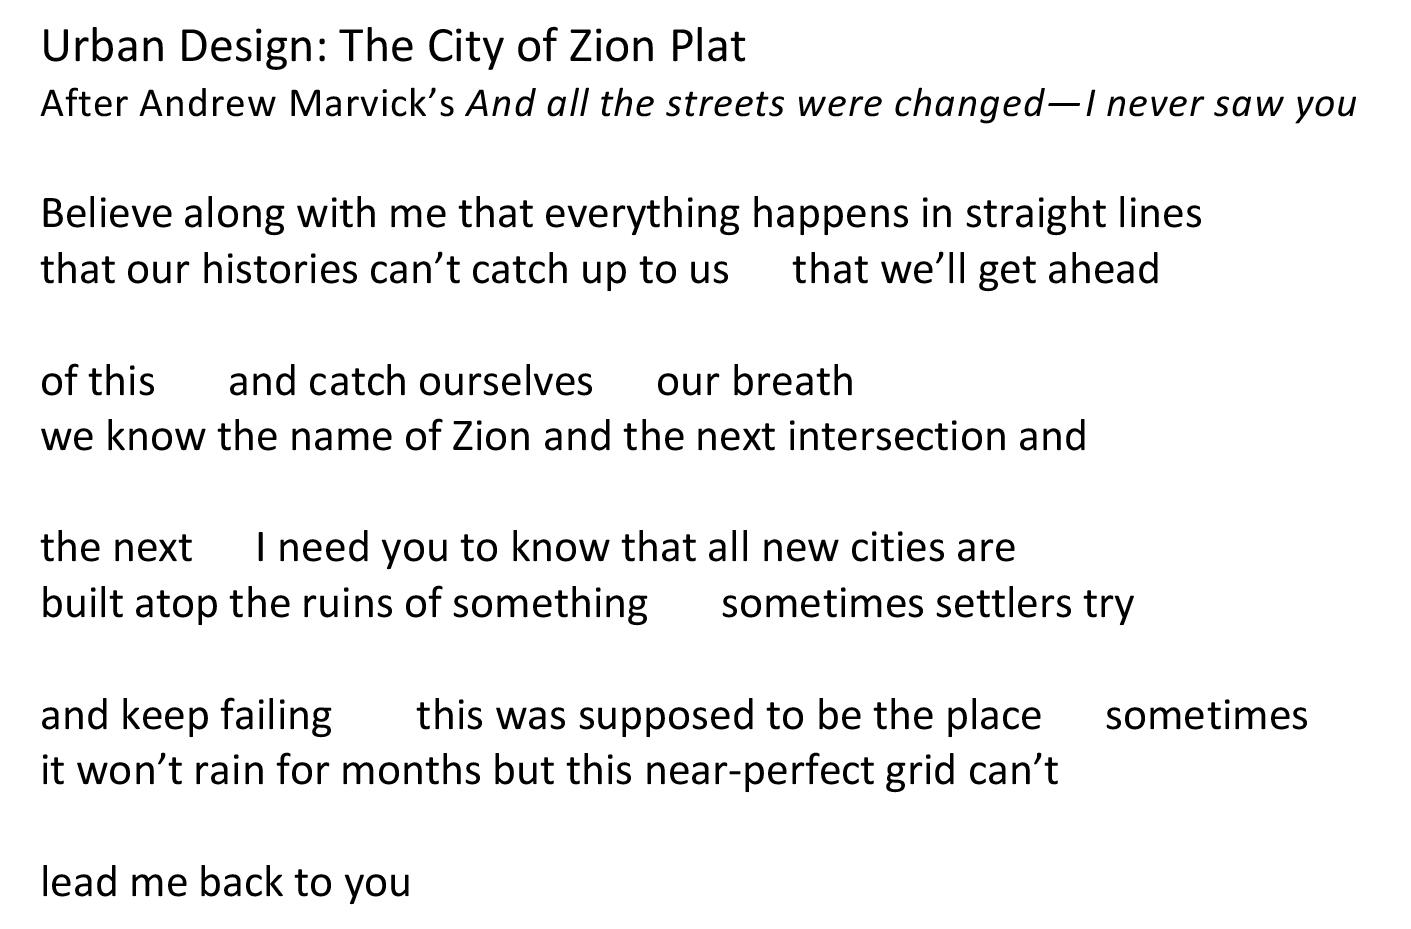 Urban Design The City of Zion Plat